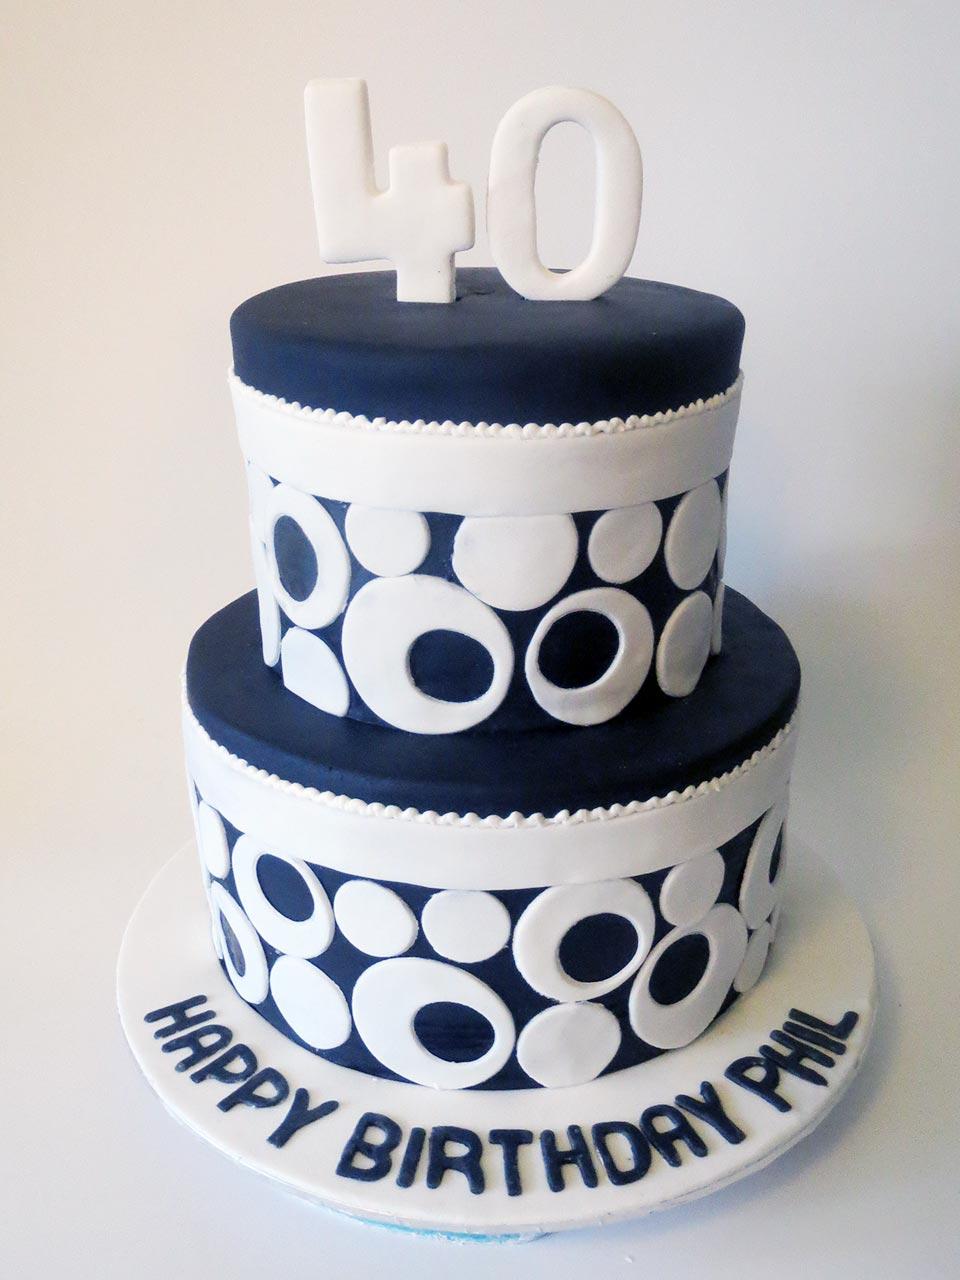 Retro Birthday Cake Three Sweeties